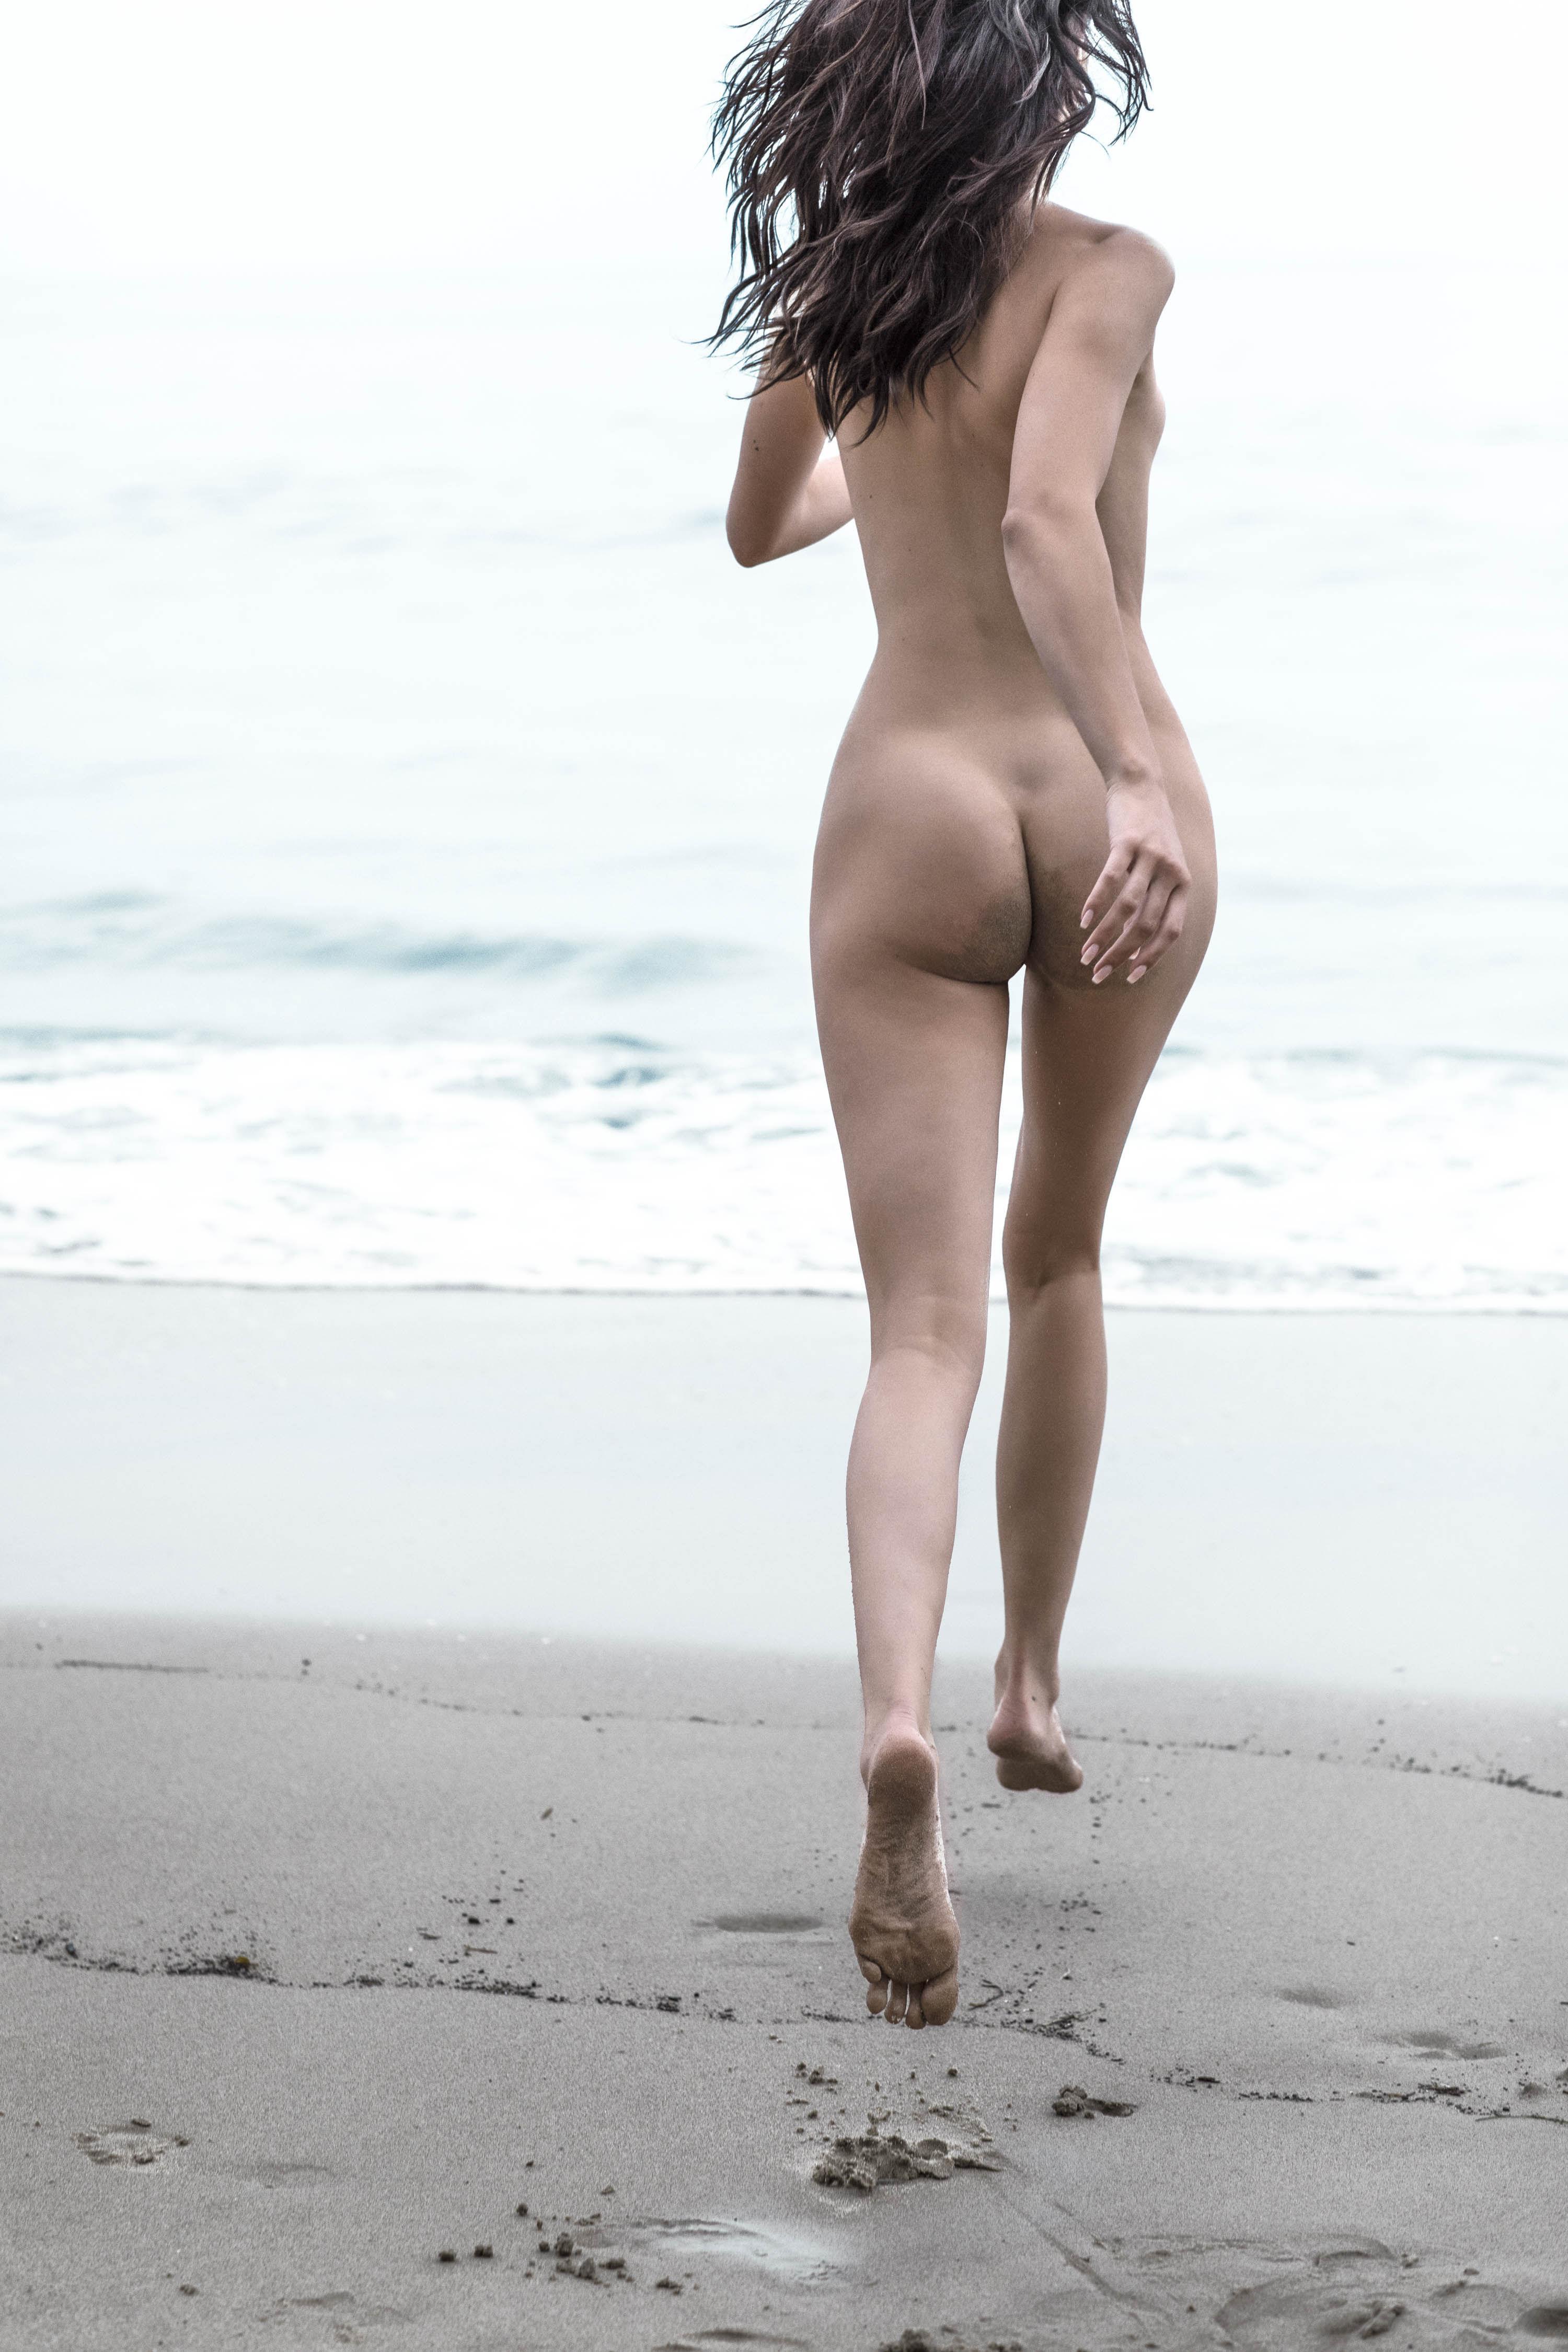 Congratulate, the Kendall jenner nude